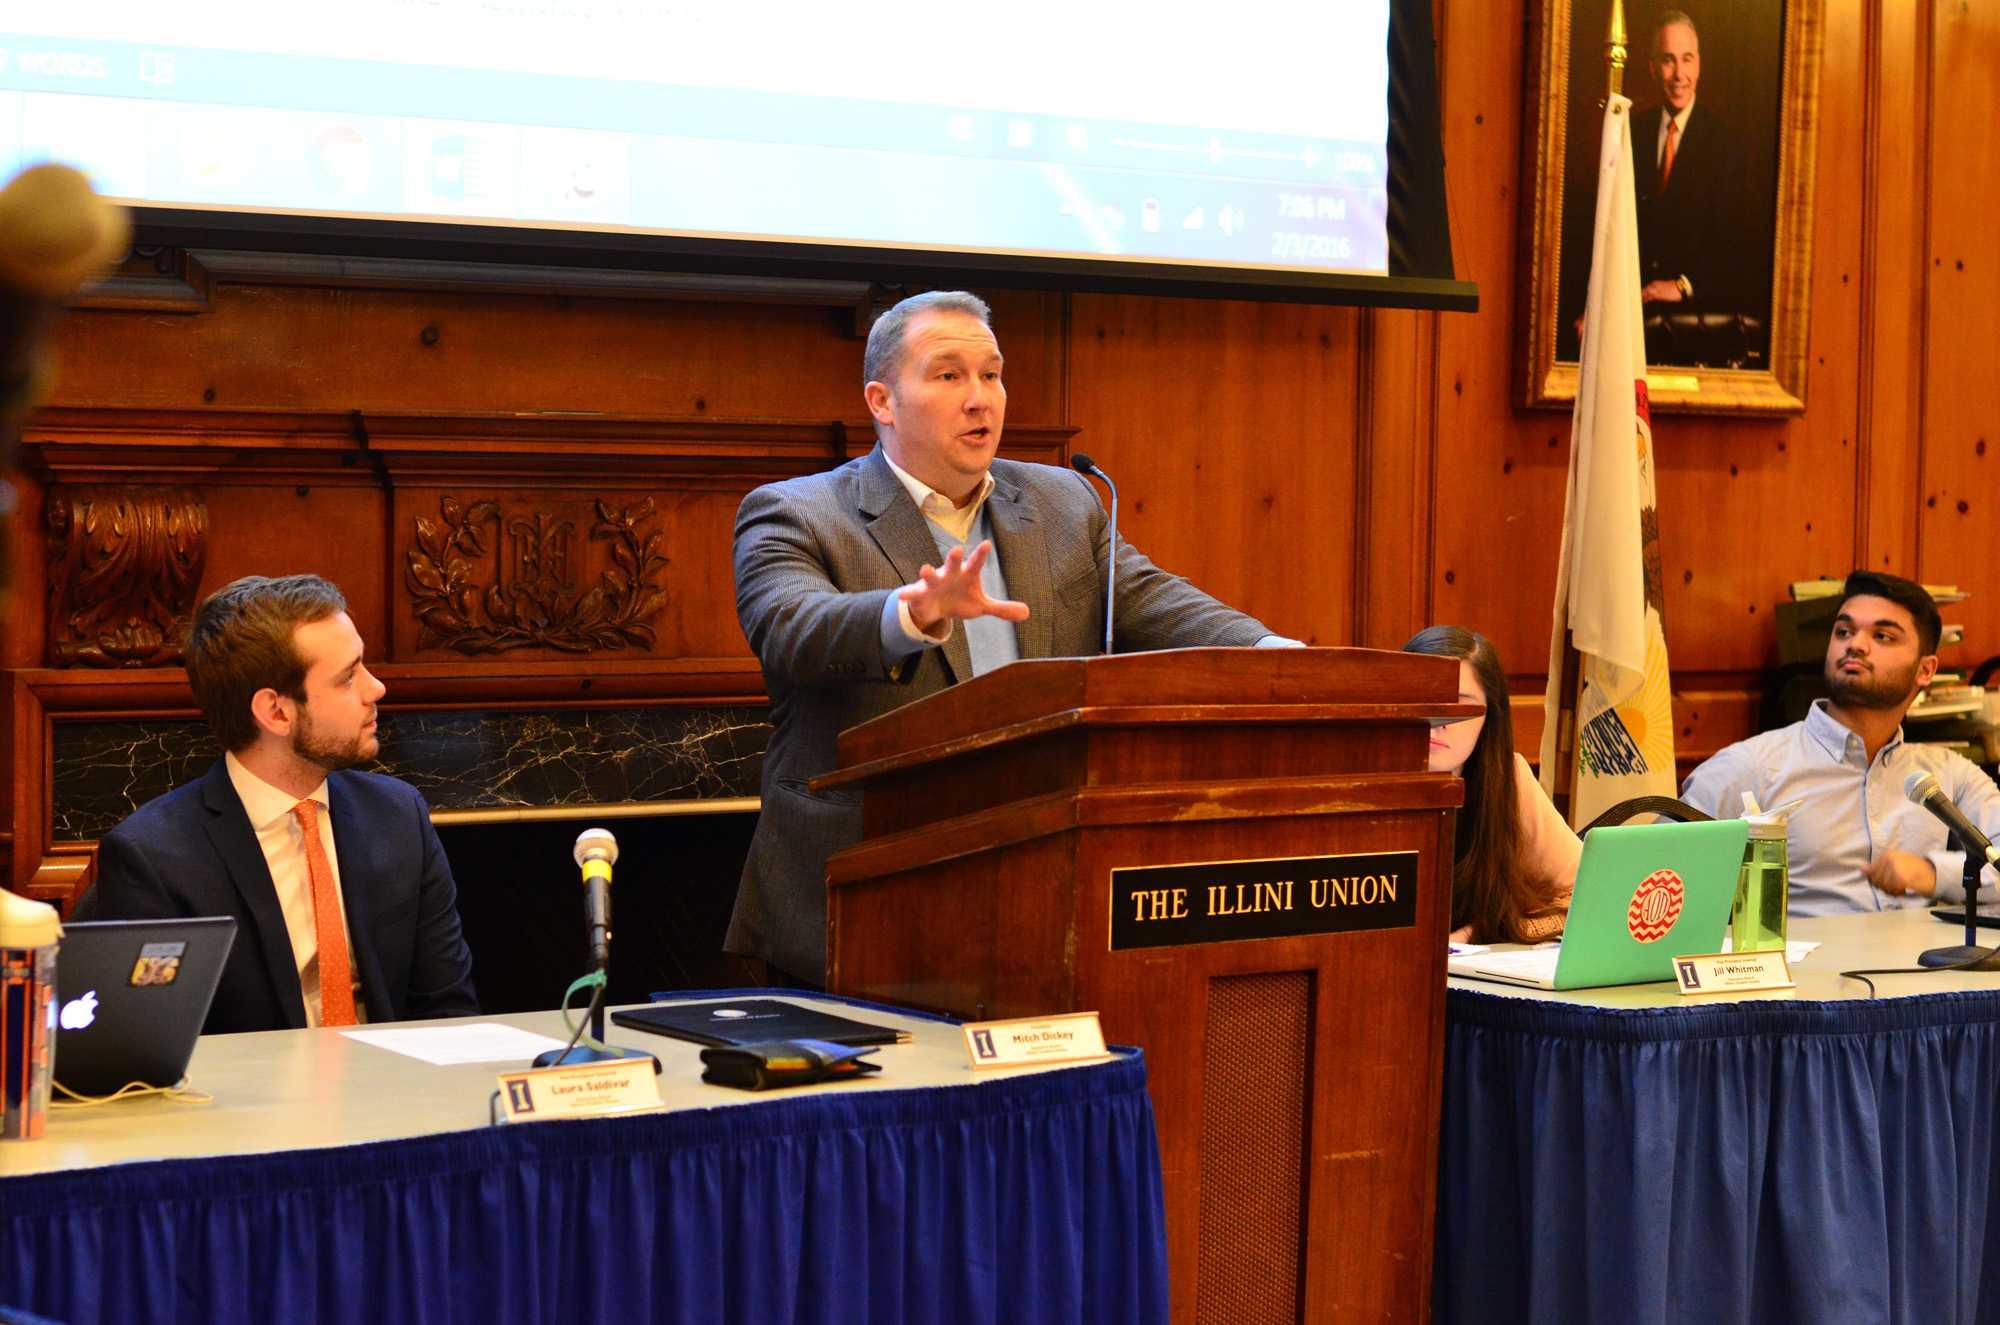 Senator Scott Bennett addresses the student senate regarding financial issues in the Illini Union on February 3, 2016.